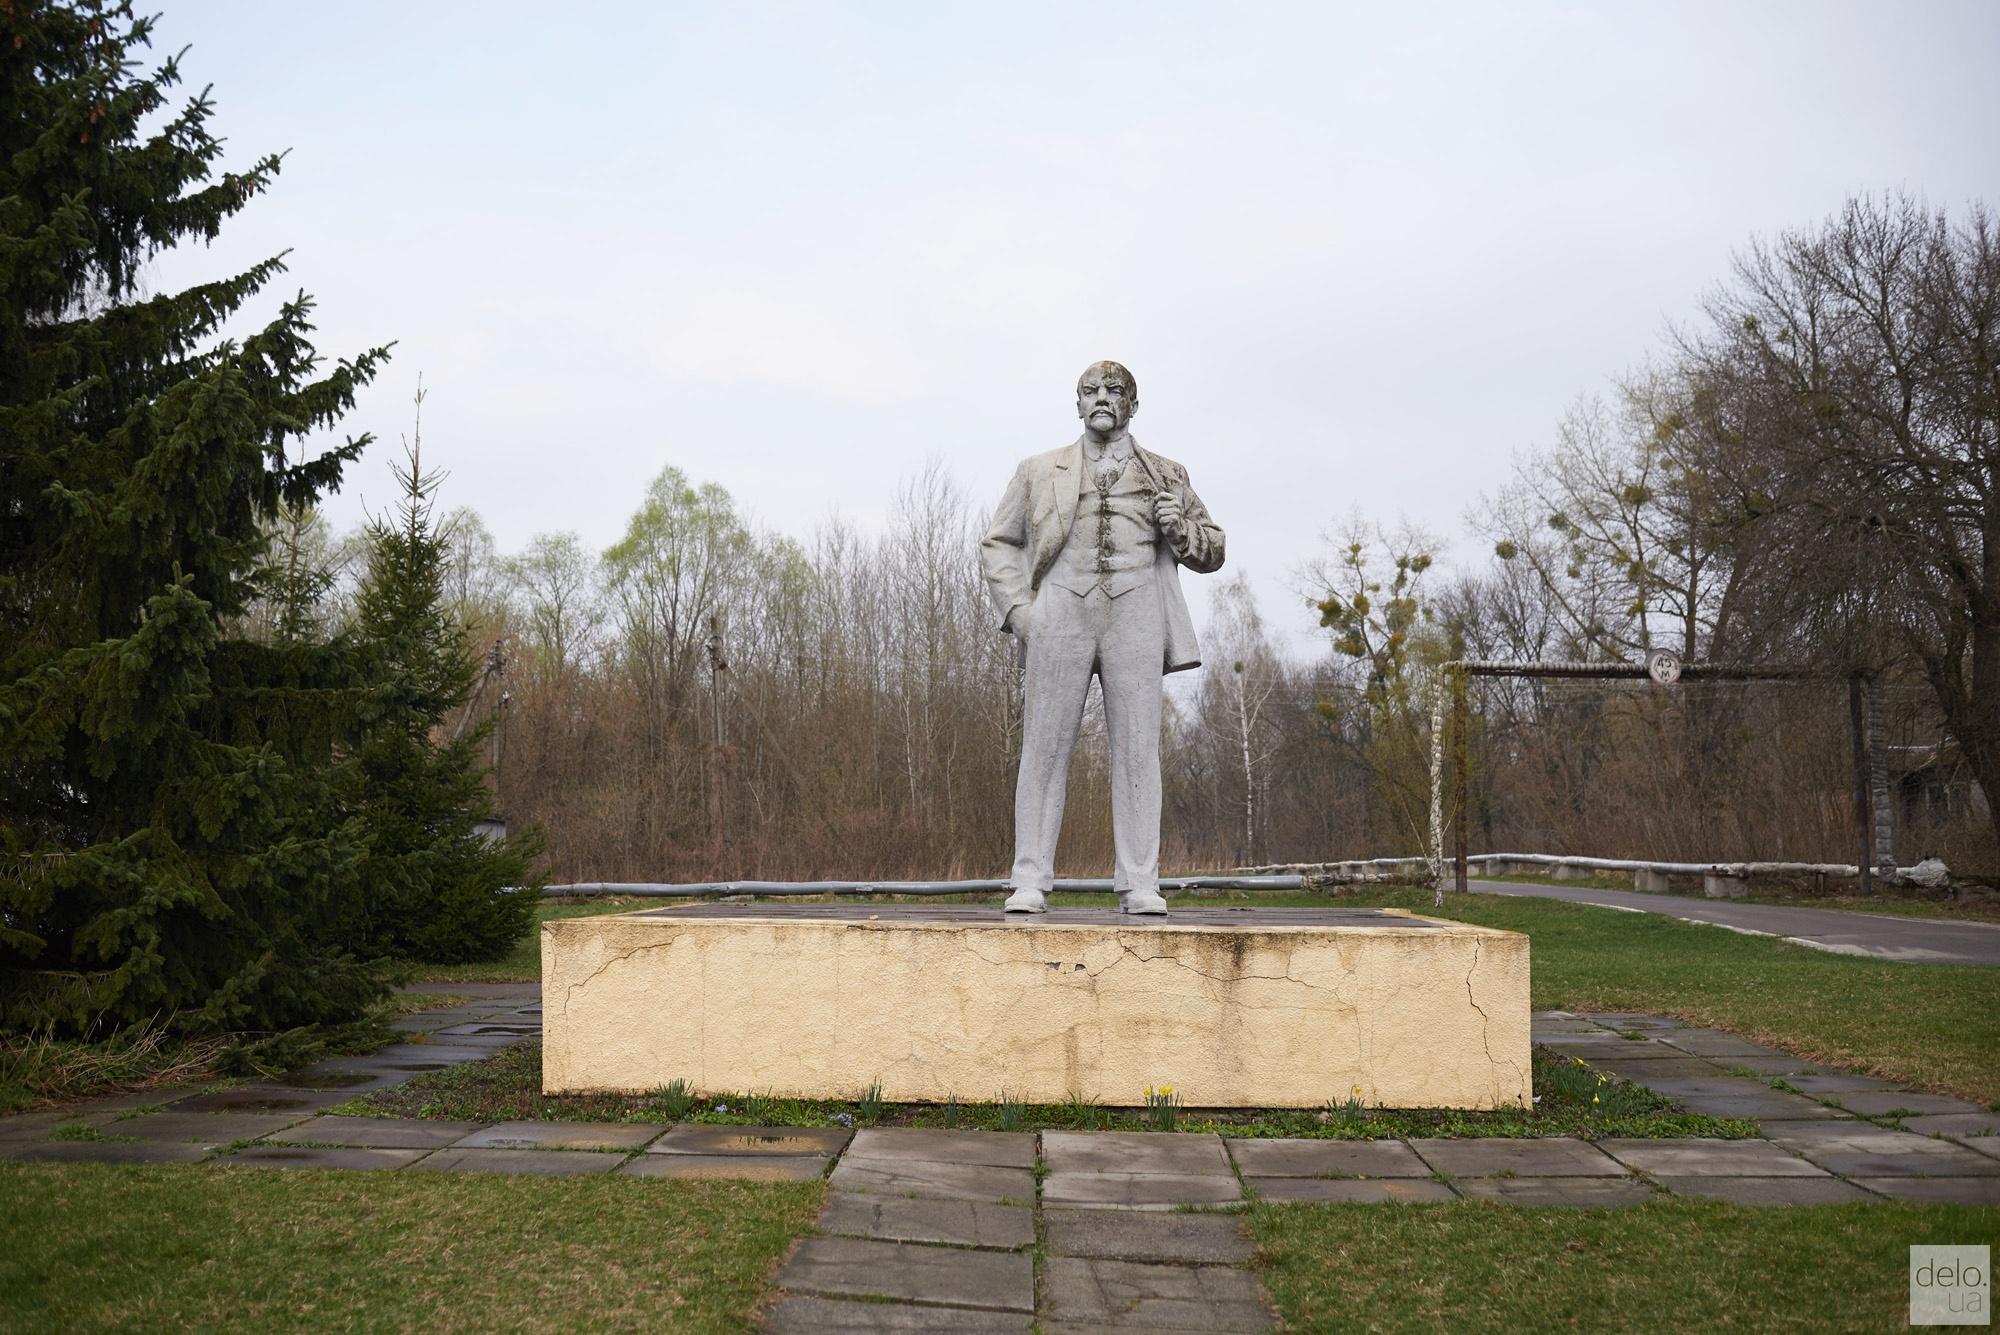 v chernobyle prodolzhaet od p0